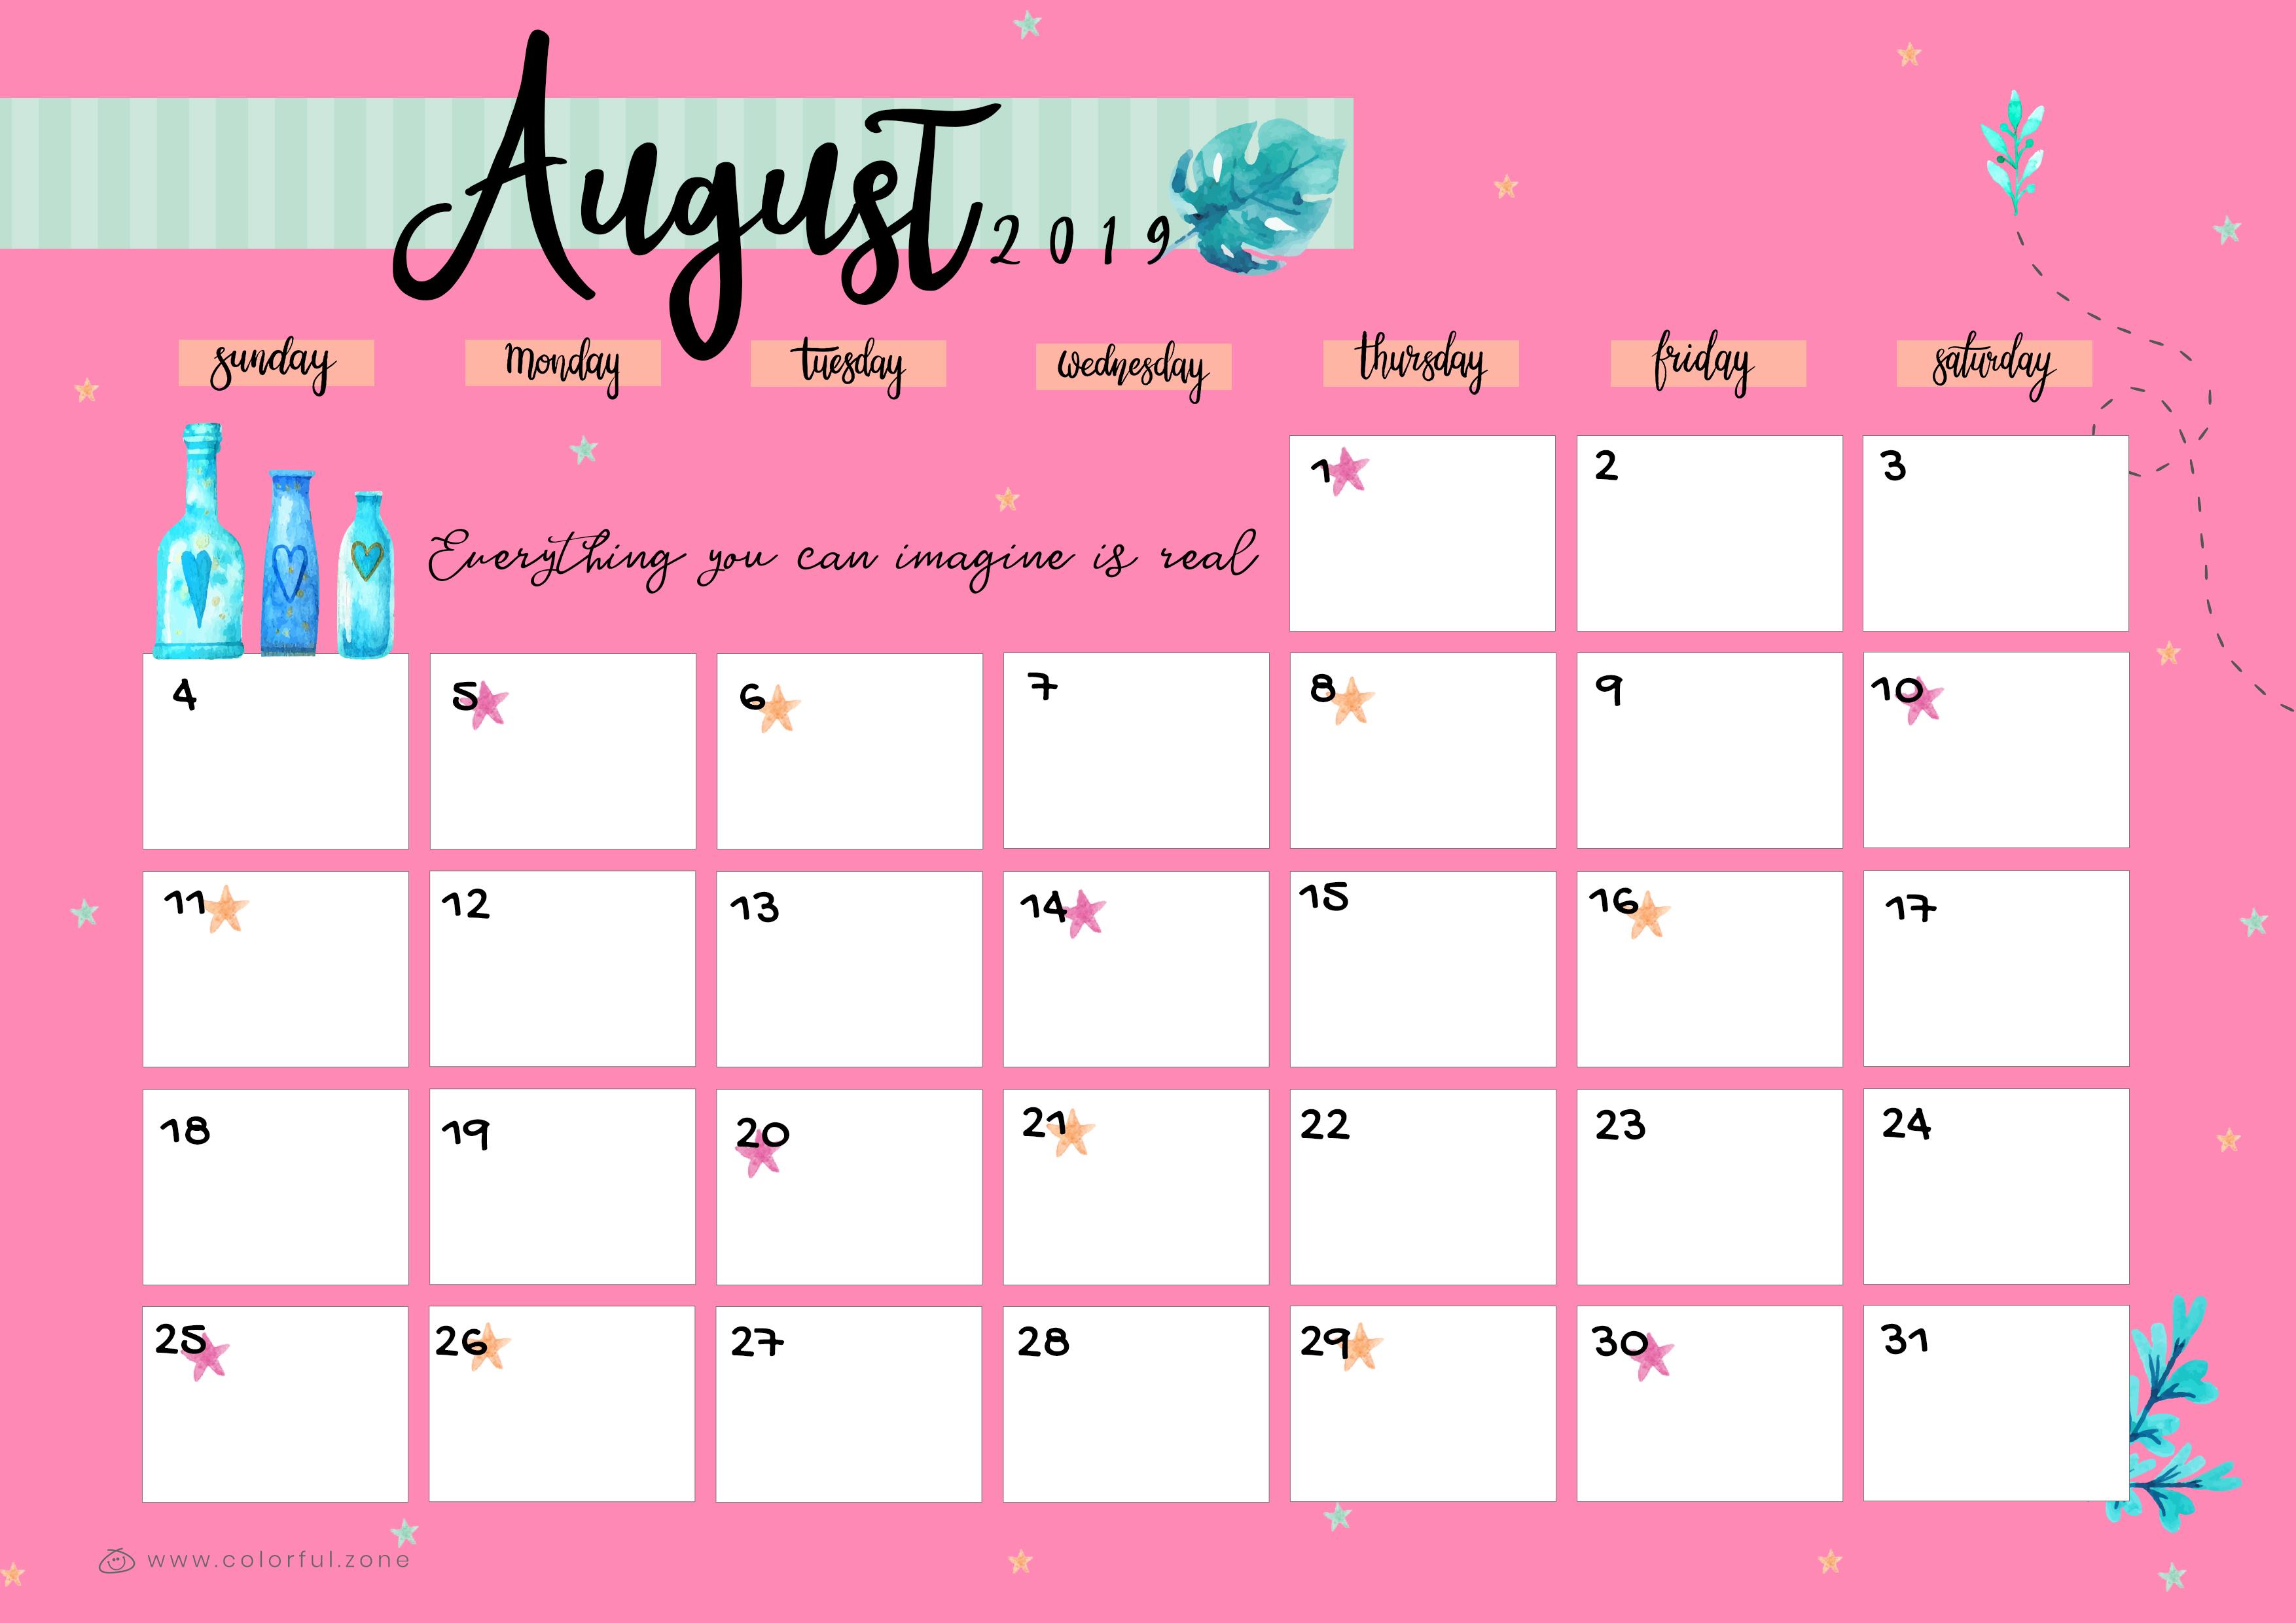 August Printable Colorful Calendar 2019